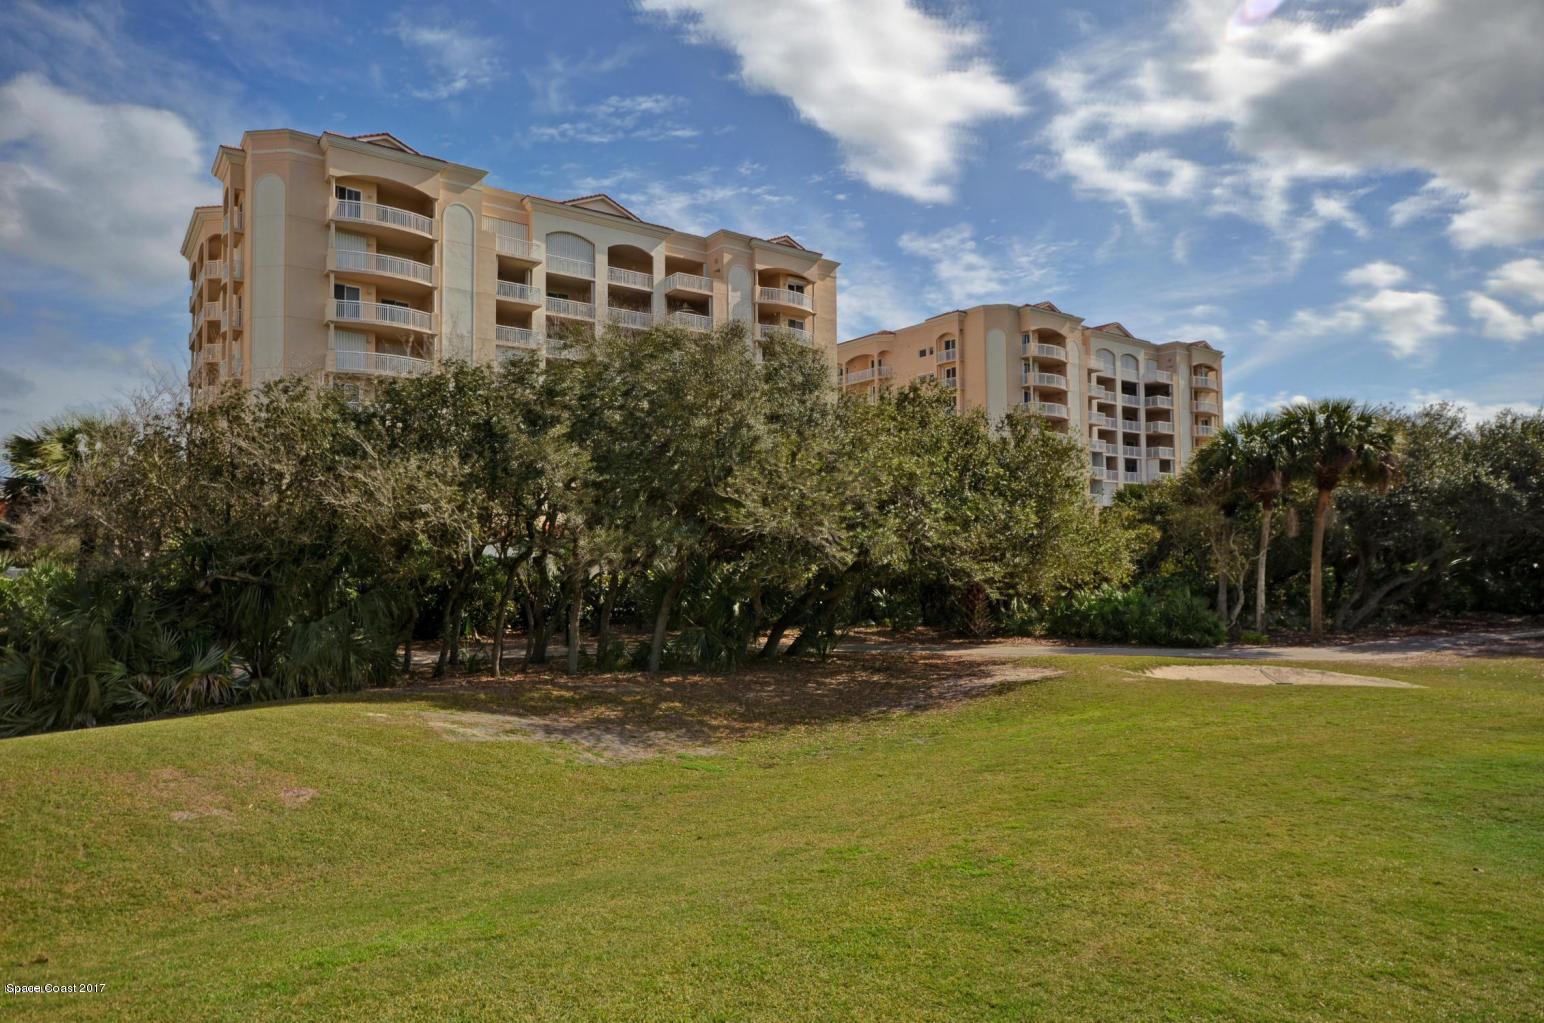 Single Family Home for Sale at 130 Warsteiner 130 Warsteiner Melbourne Beach, Florida 32951 United States